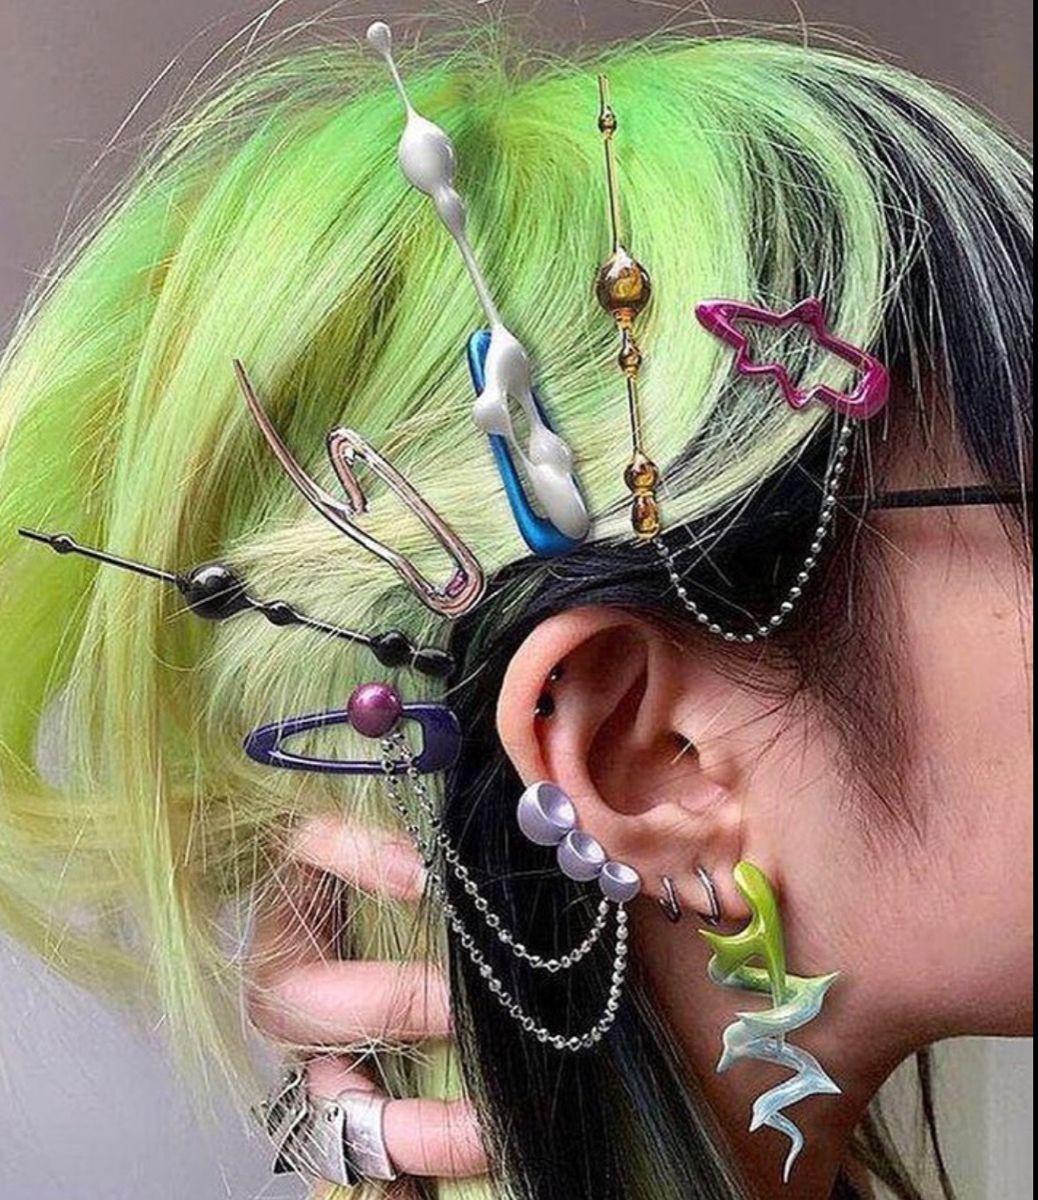 Home In 2021 Hair Clips Grunge Hair Aesthetic Hair